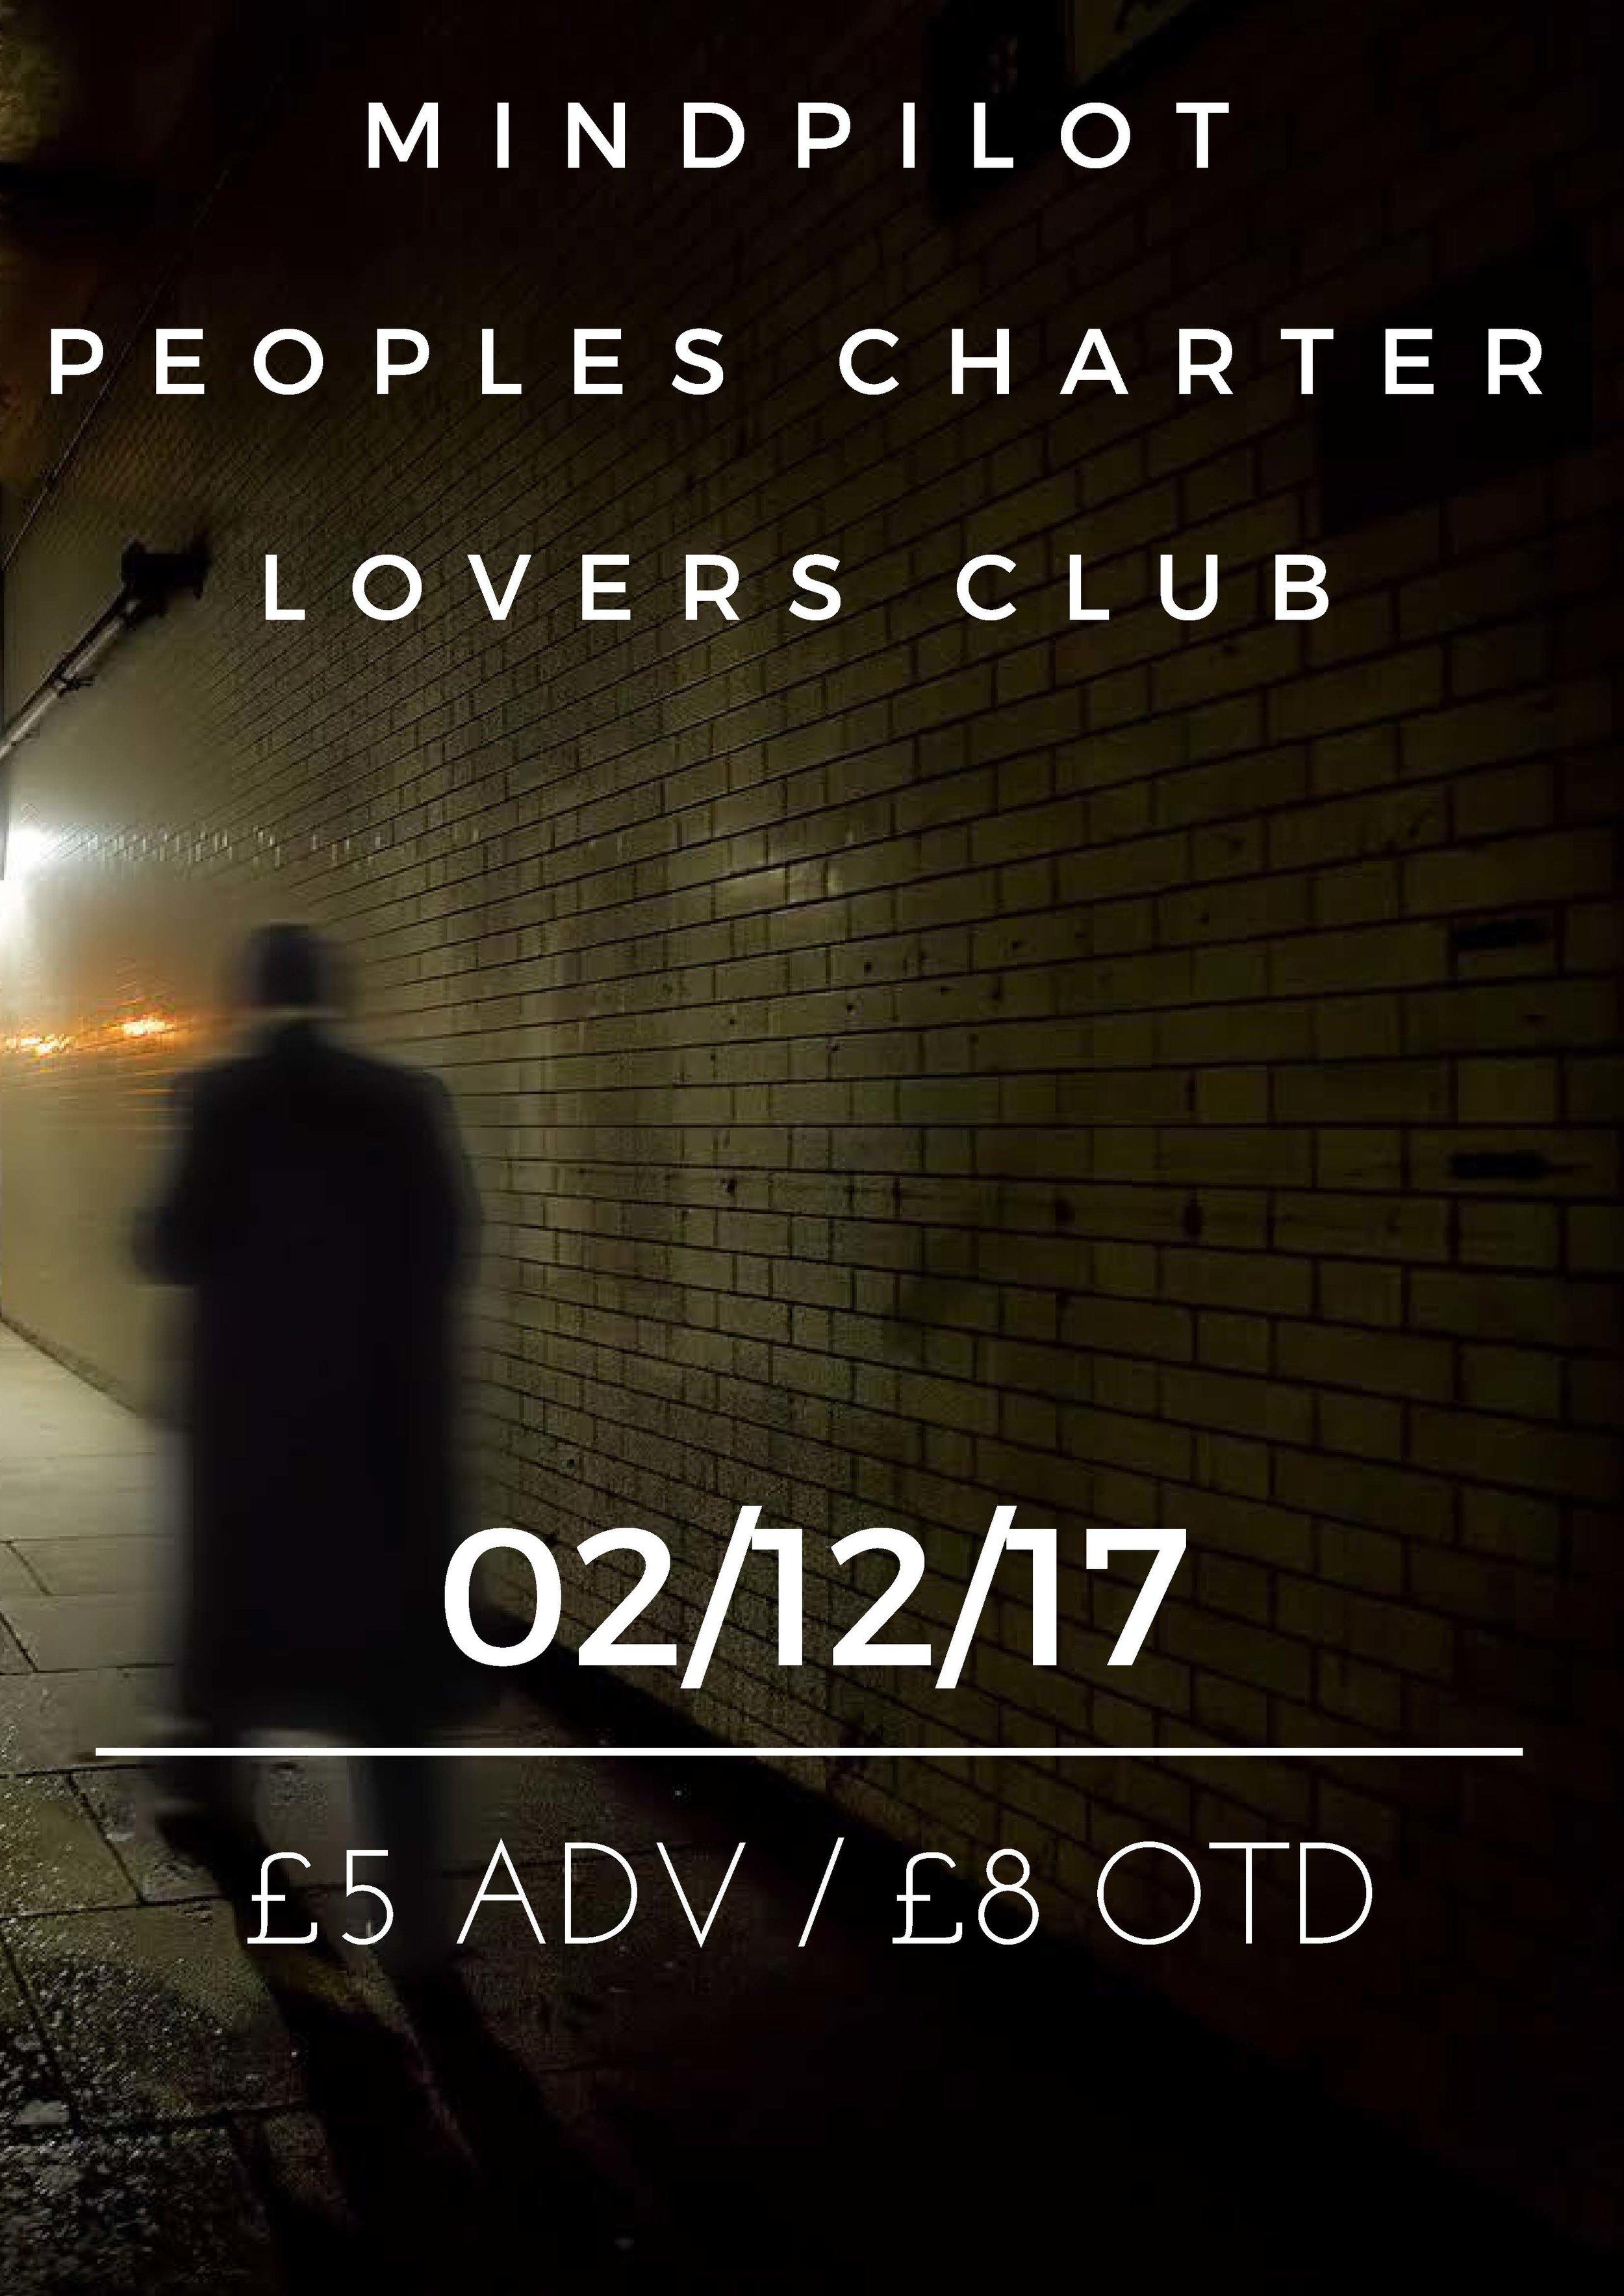 MINDPiLOTPeoples CharterLovers Club.jpg